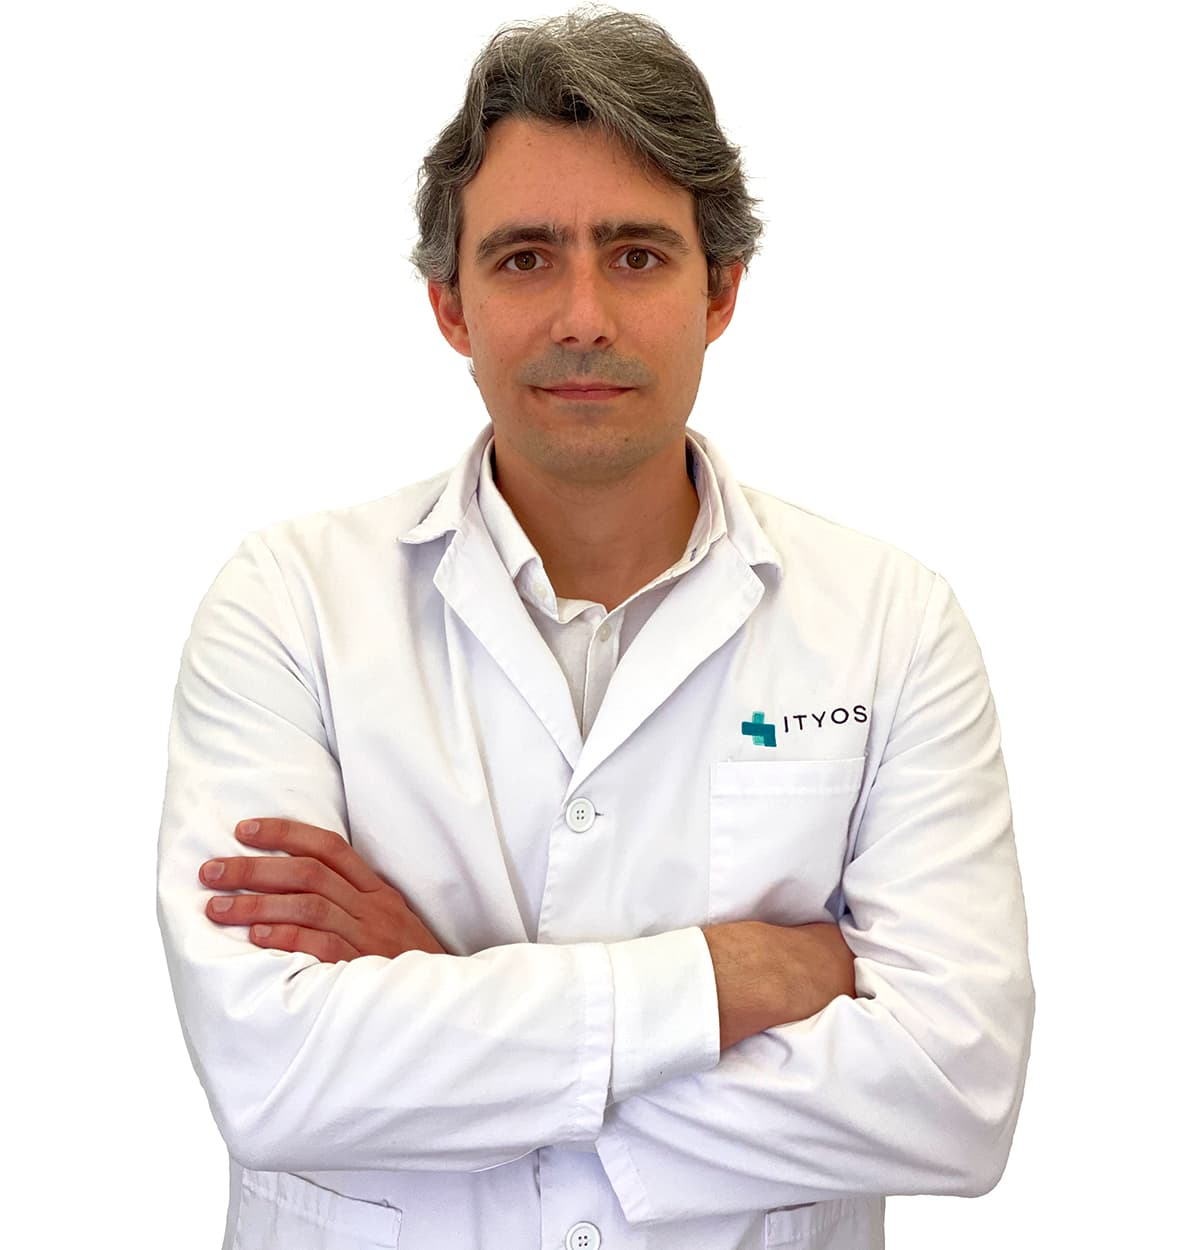 Dr. José Terán